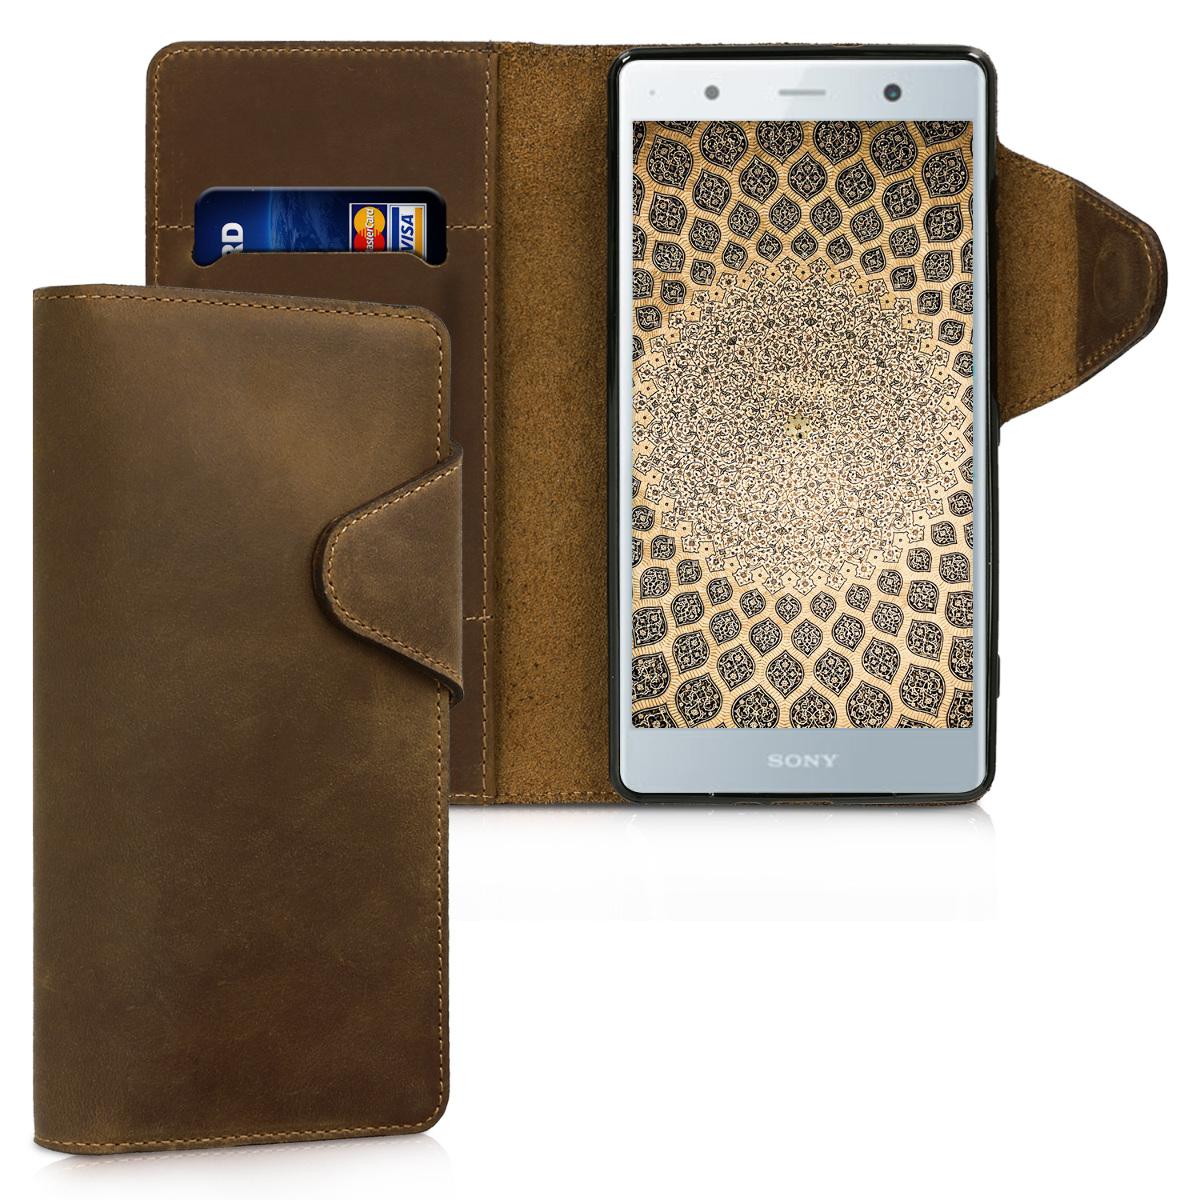 Kalibri Δερμάτινη Suede Θήκη - Πορτοφόλι Sony Xperia XZ2 Premium - Brown (45007.05)